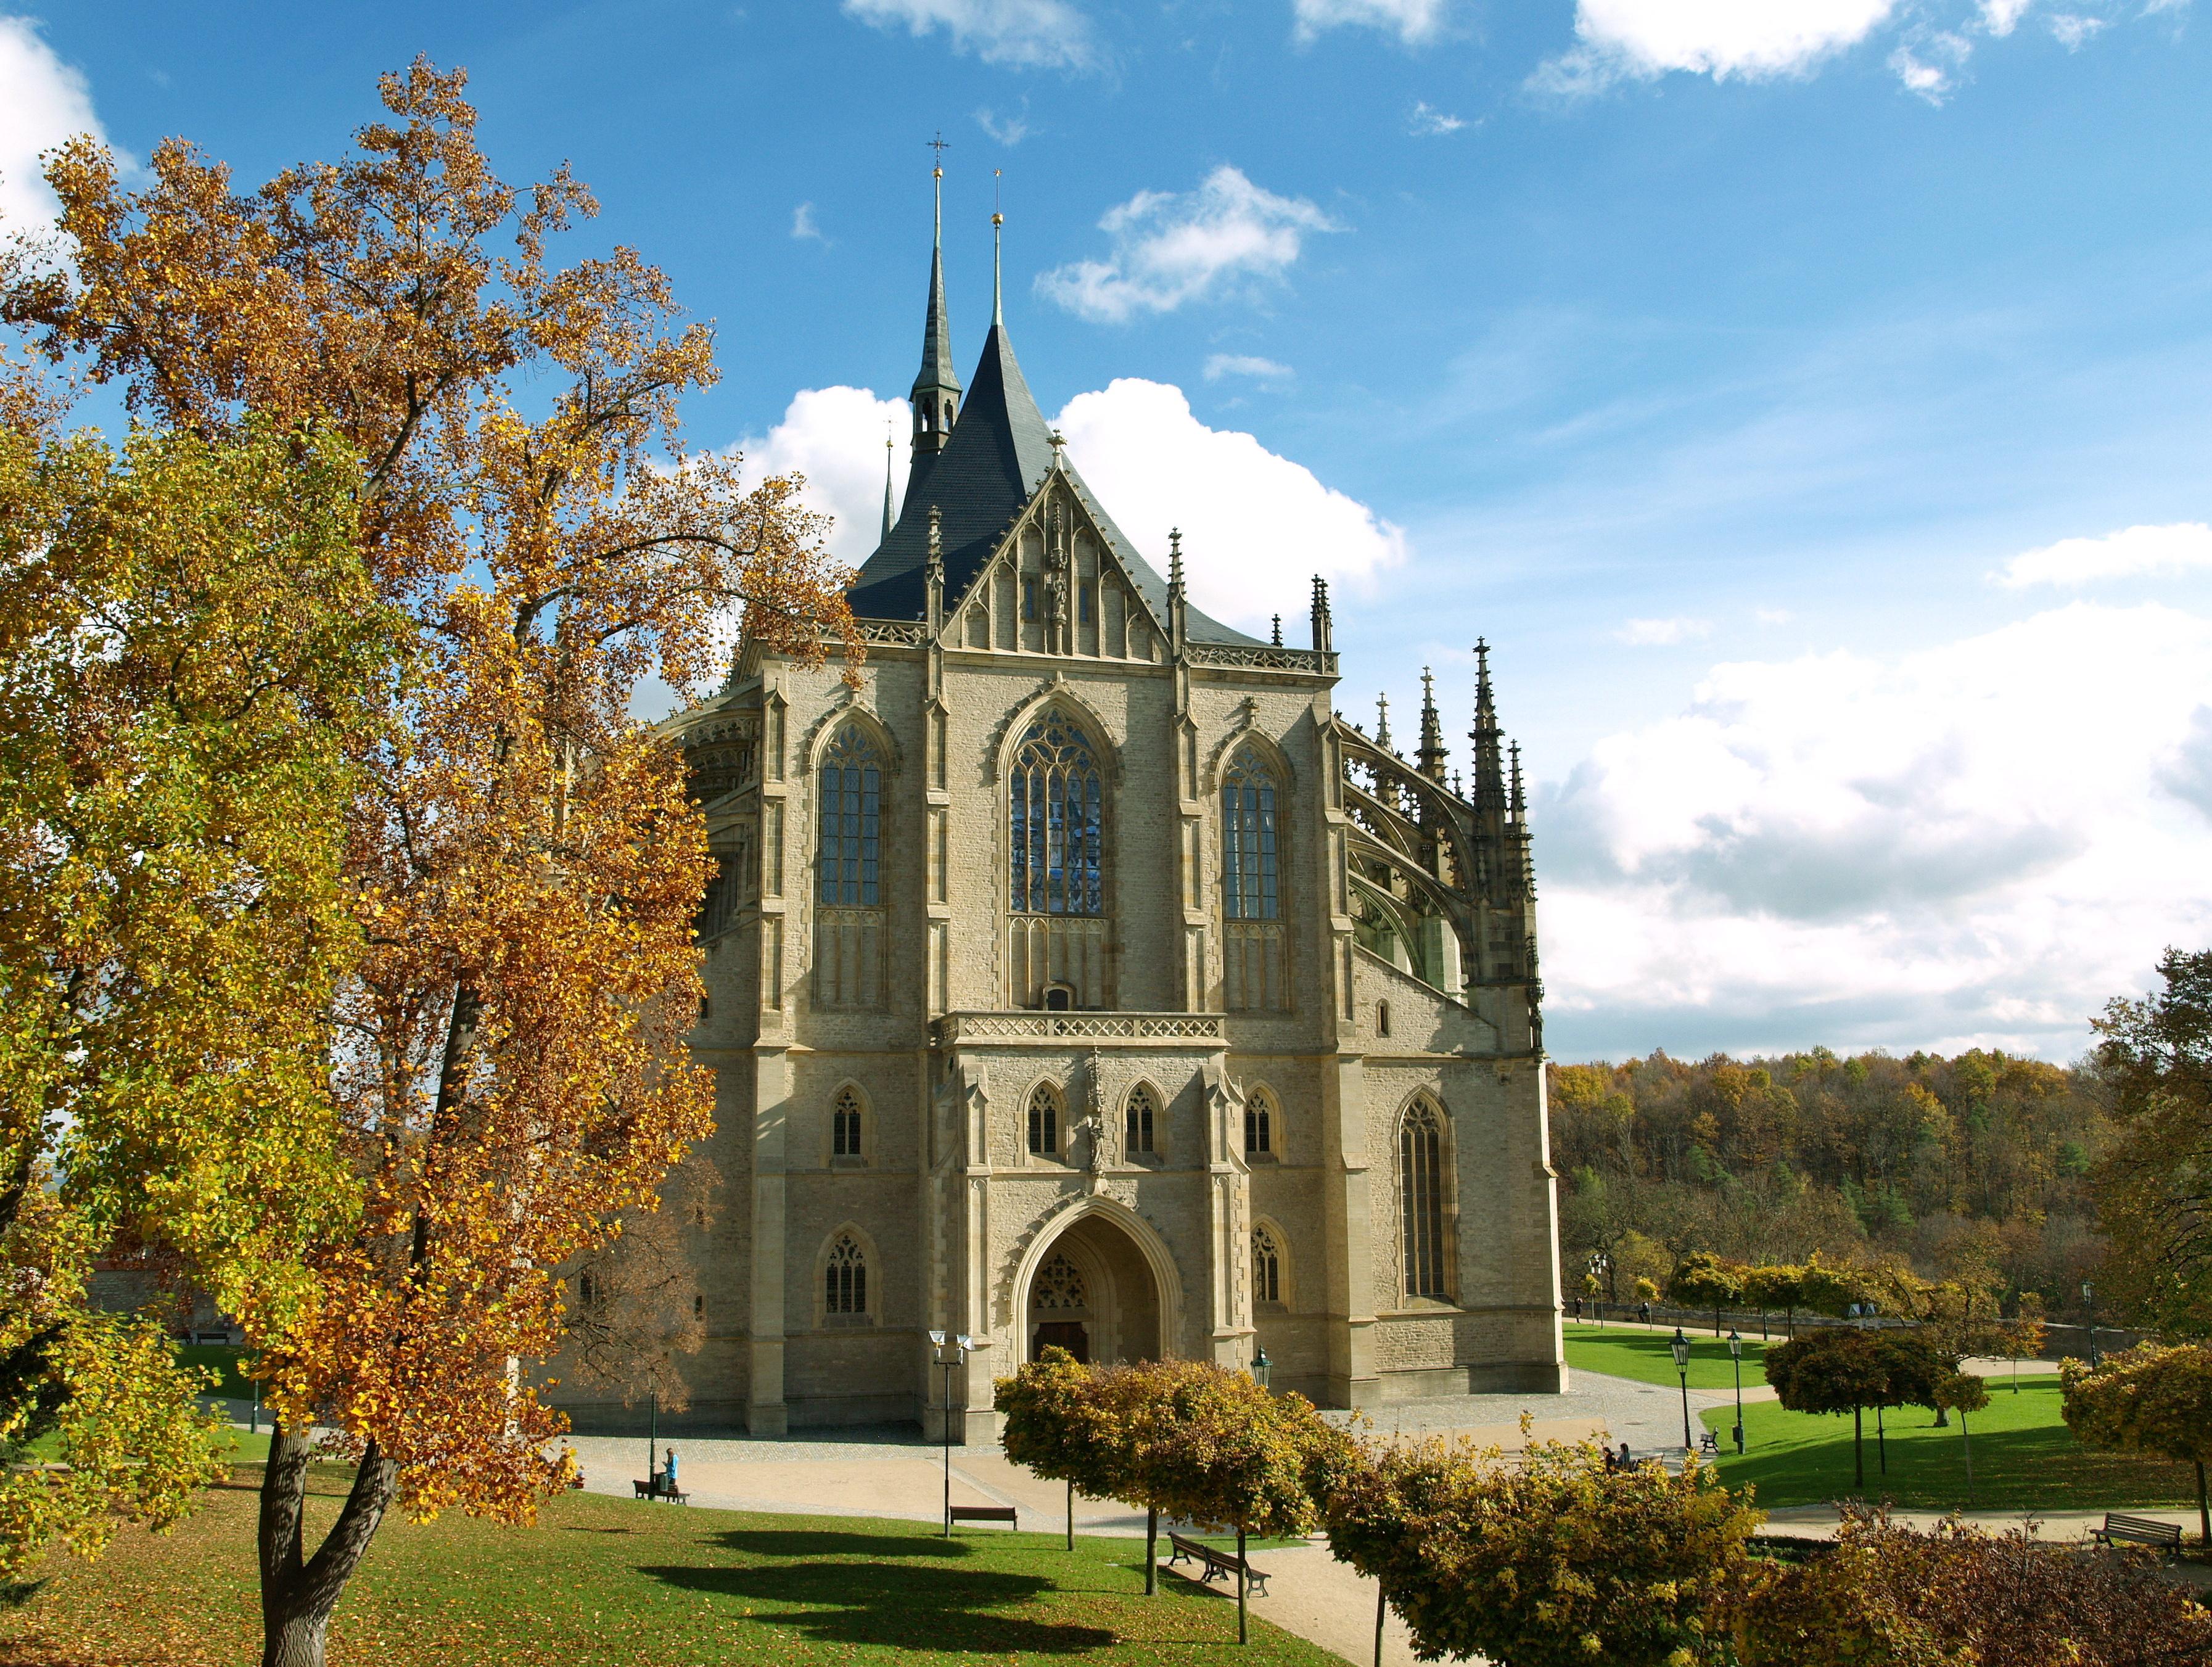 6812-chram-sv-barbory-st-barbara-s-cathedral.jpg